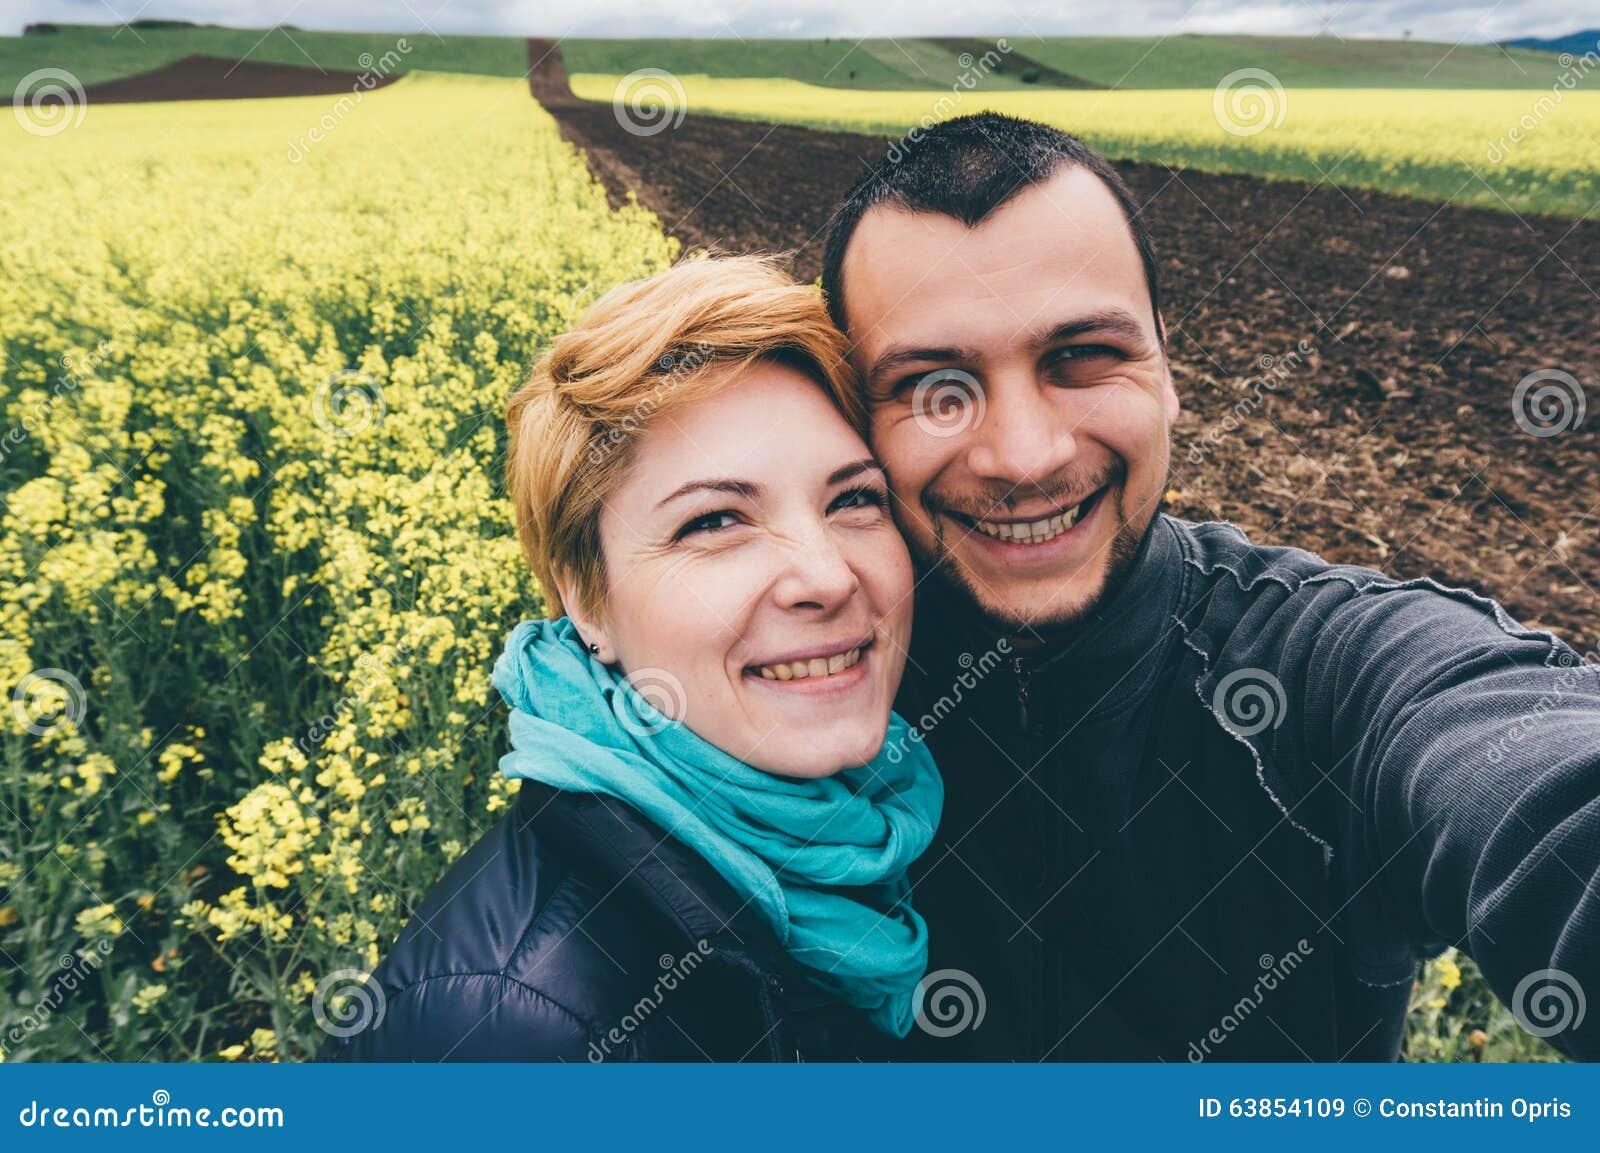 Selfie i canolafält